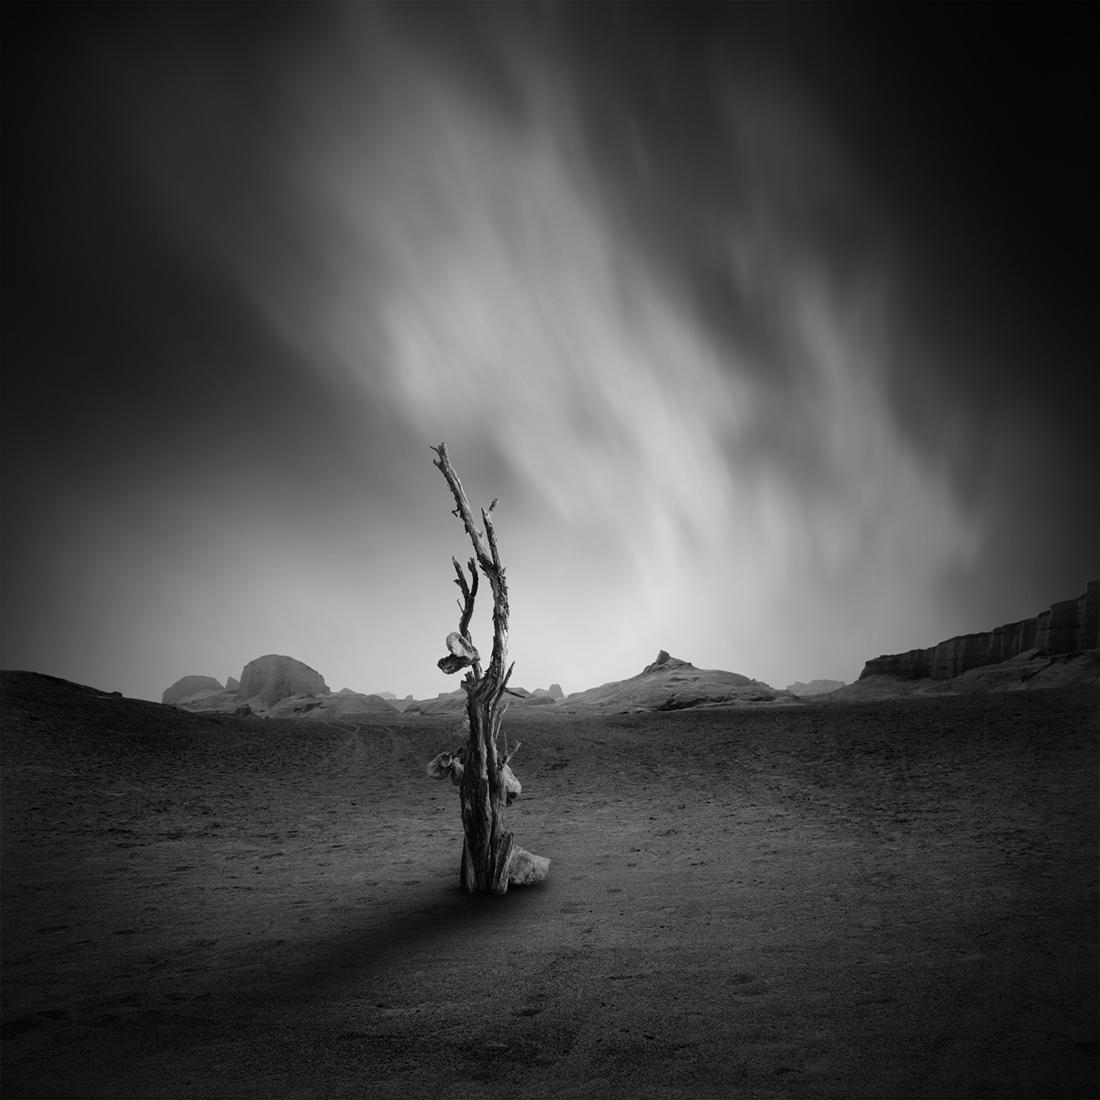 42_Tree of life by Hasibe Borhani (1).jpg